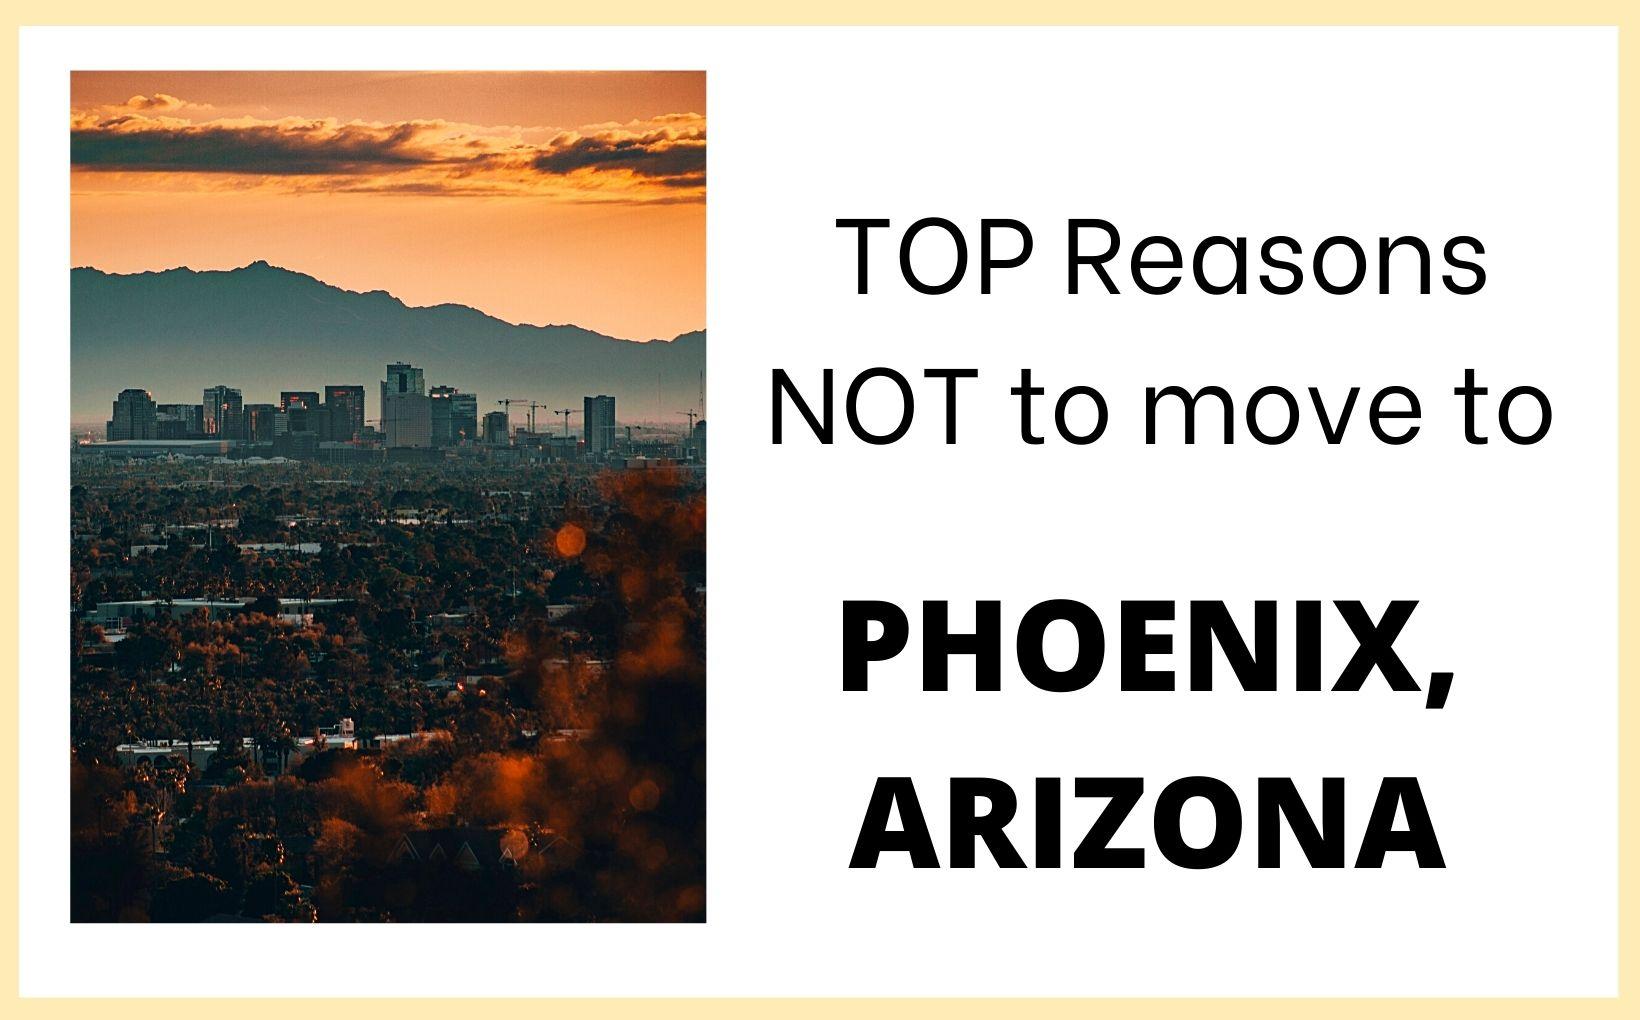 Reasons not to move to Phoenix Arizona feature image